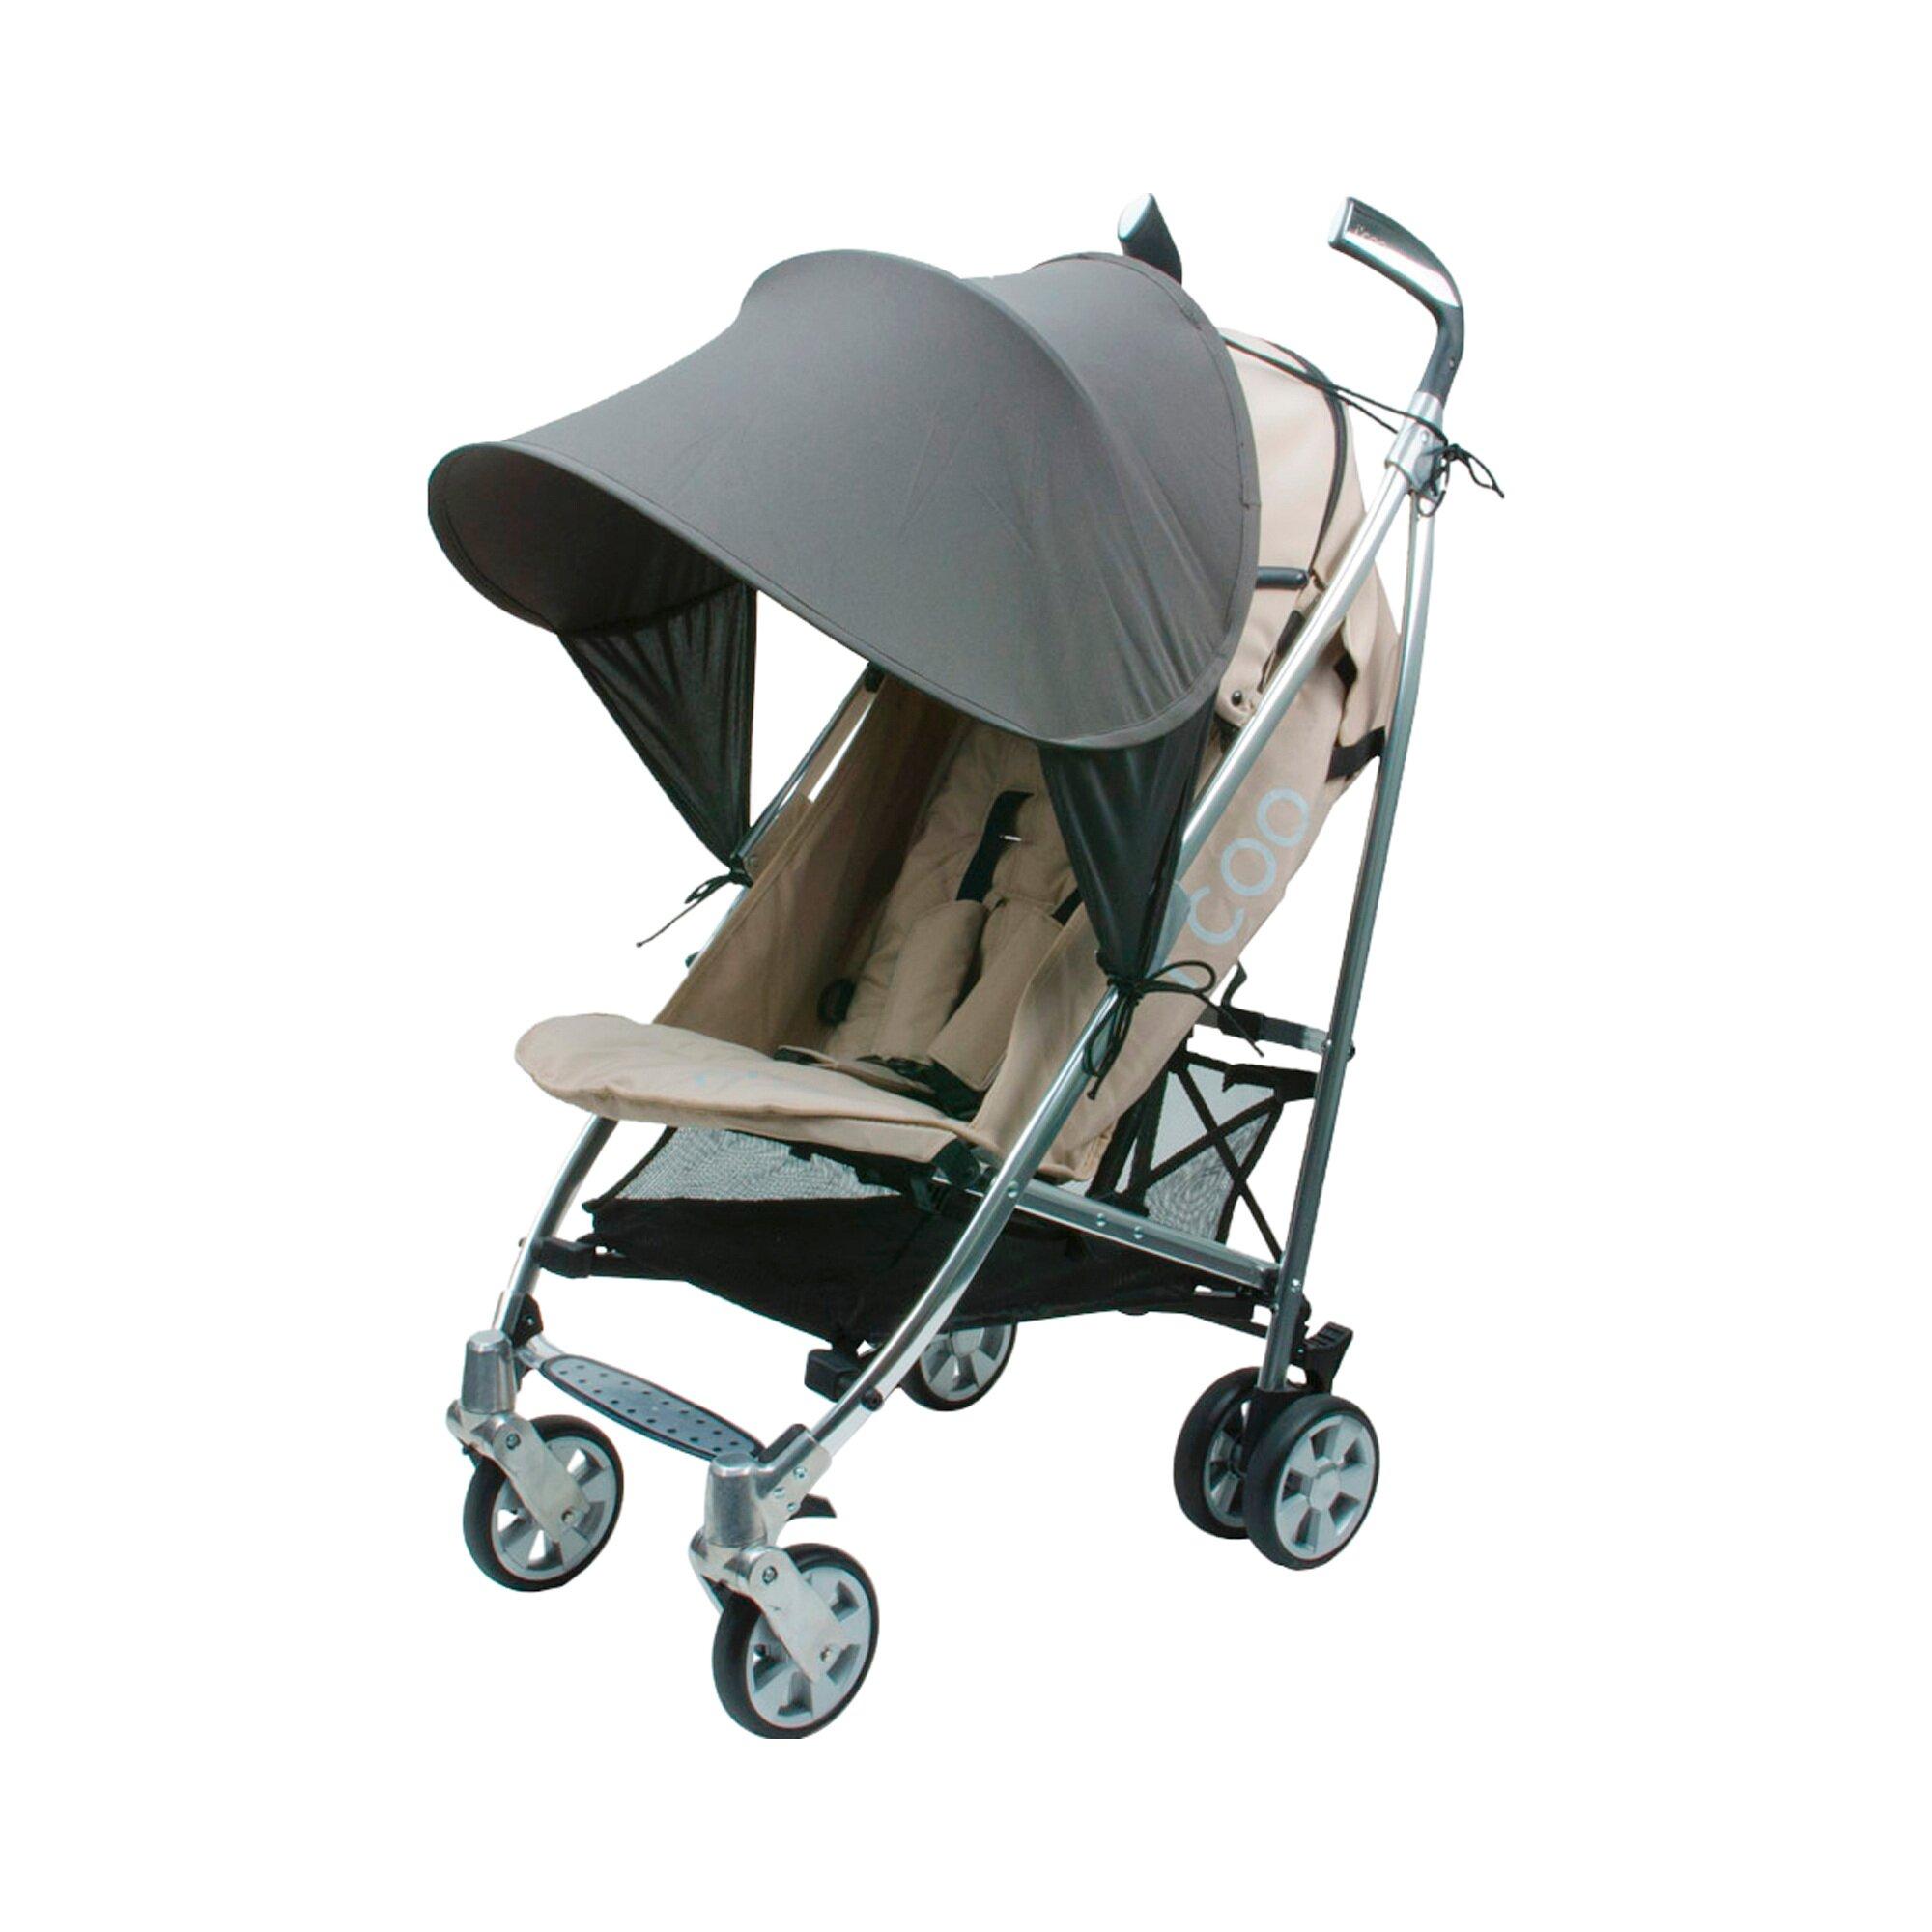 diago-sonnenverdeck-universal-premium-fur-kinderwagen-grau